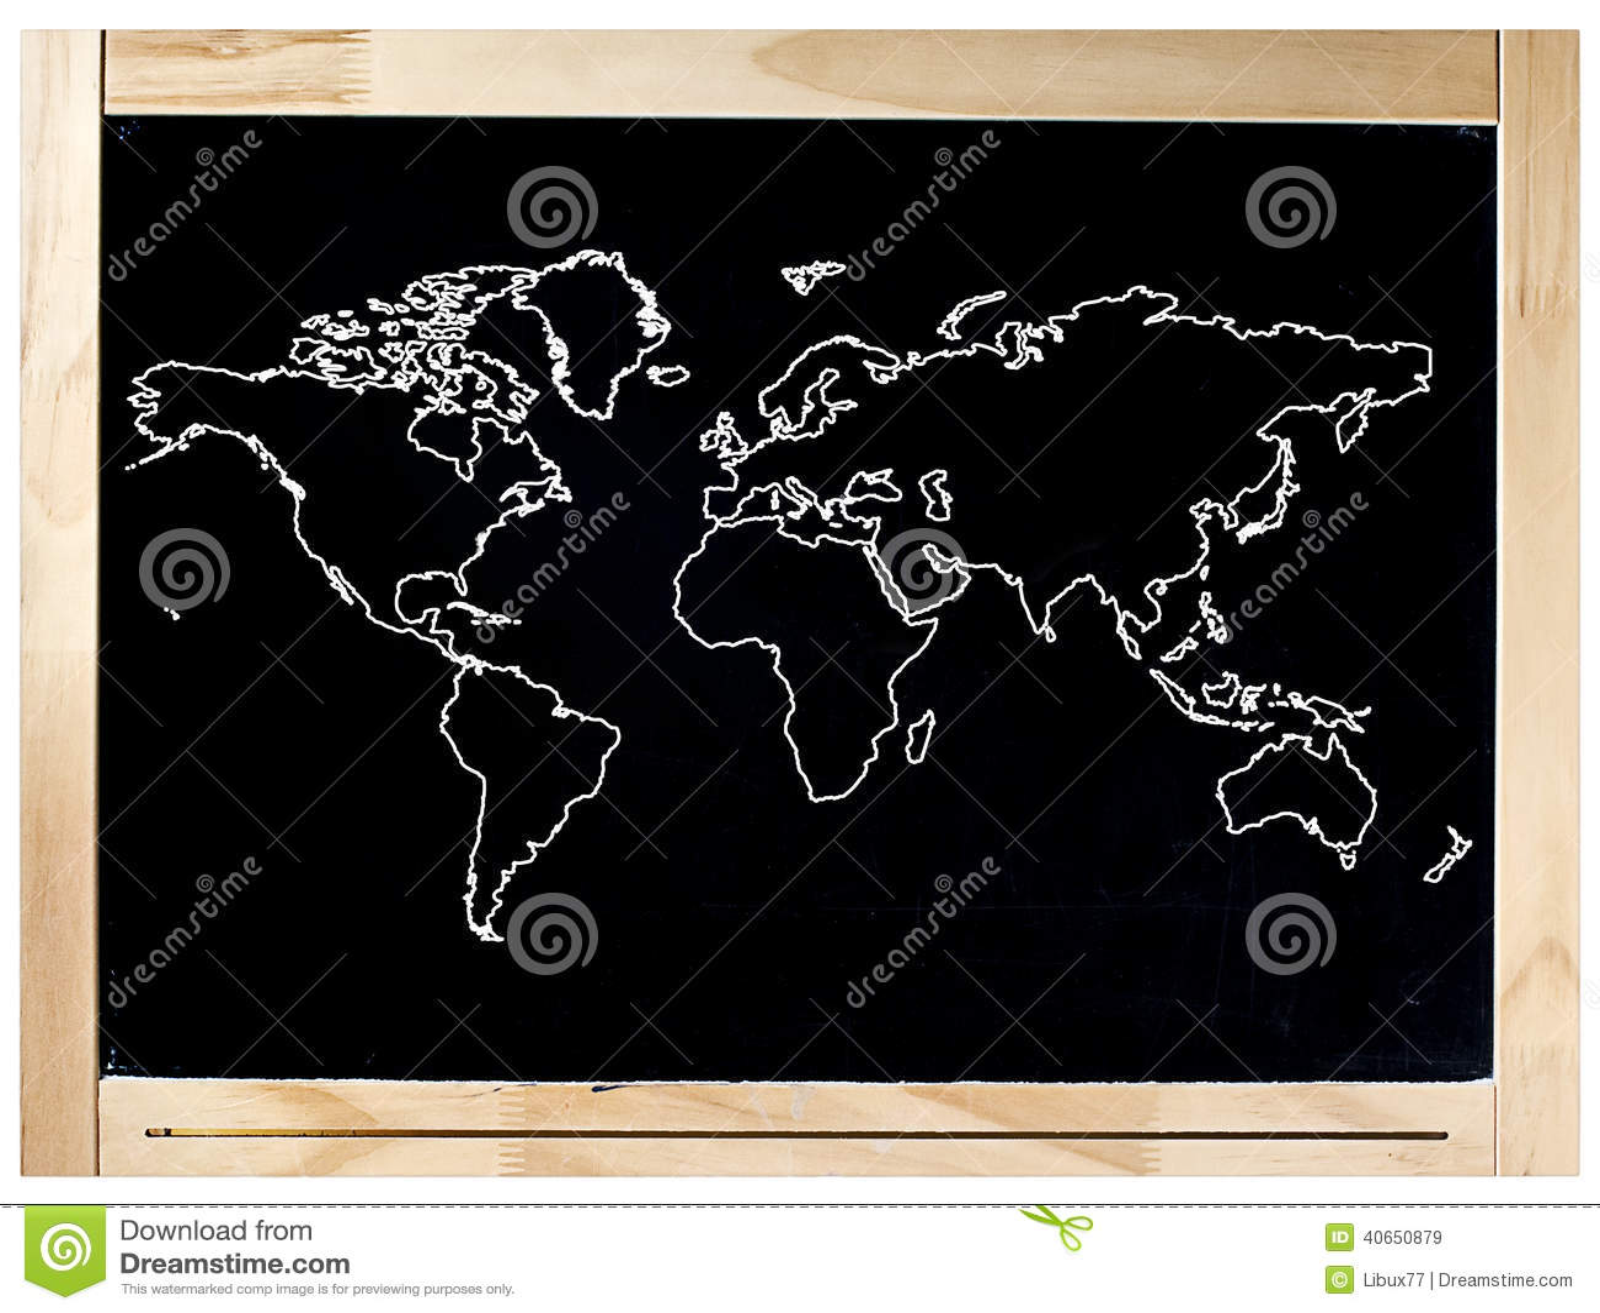 Tafel-Rahmen-Weltkarte Lokalisiert Stockbild - Bild von karte, weiß ...